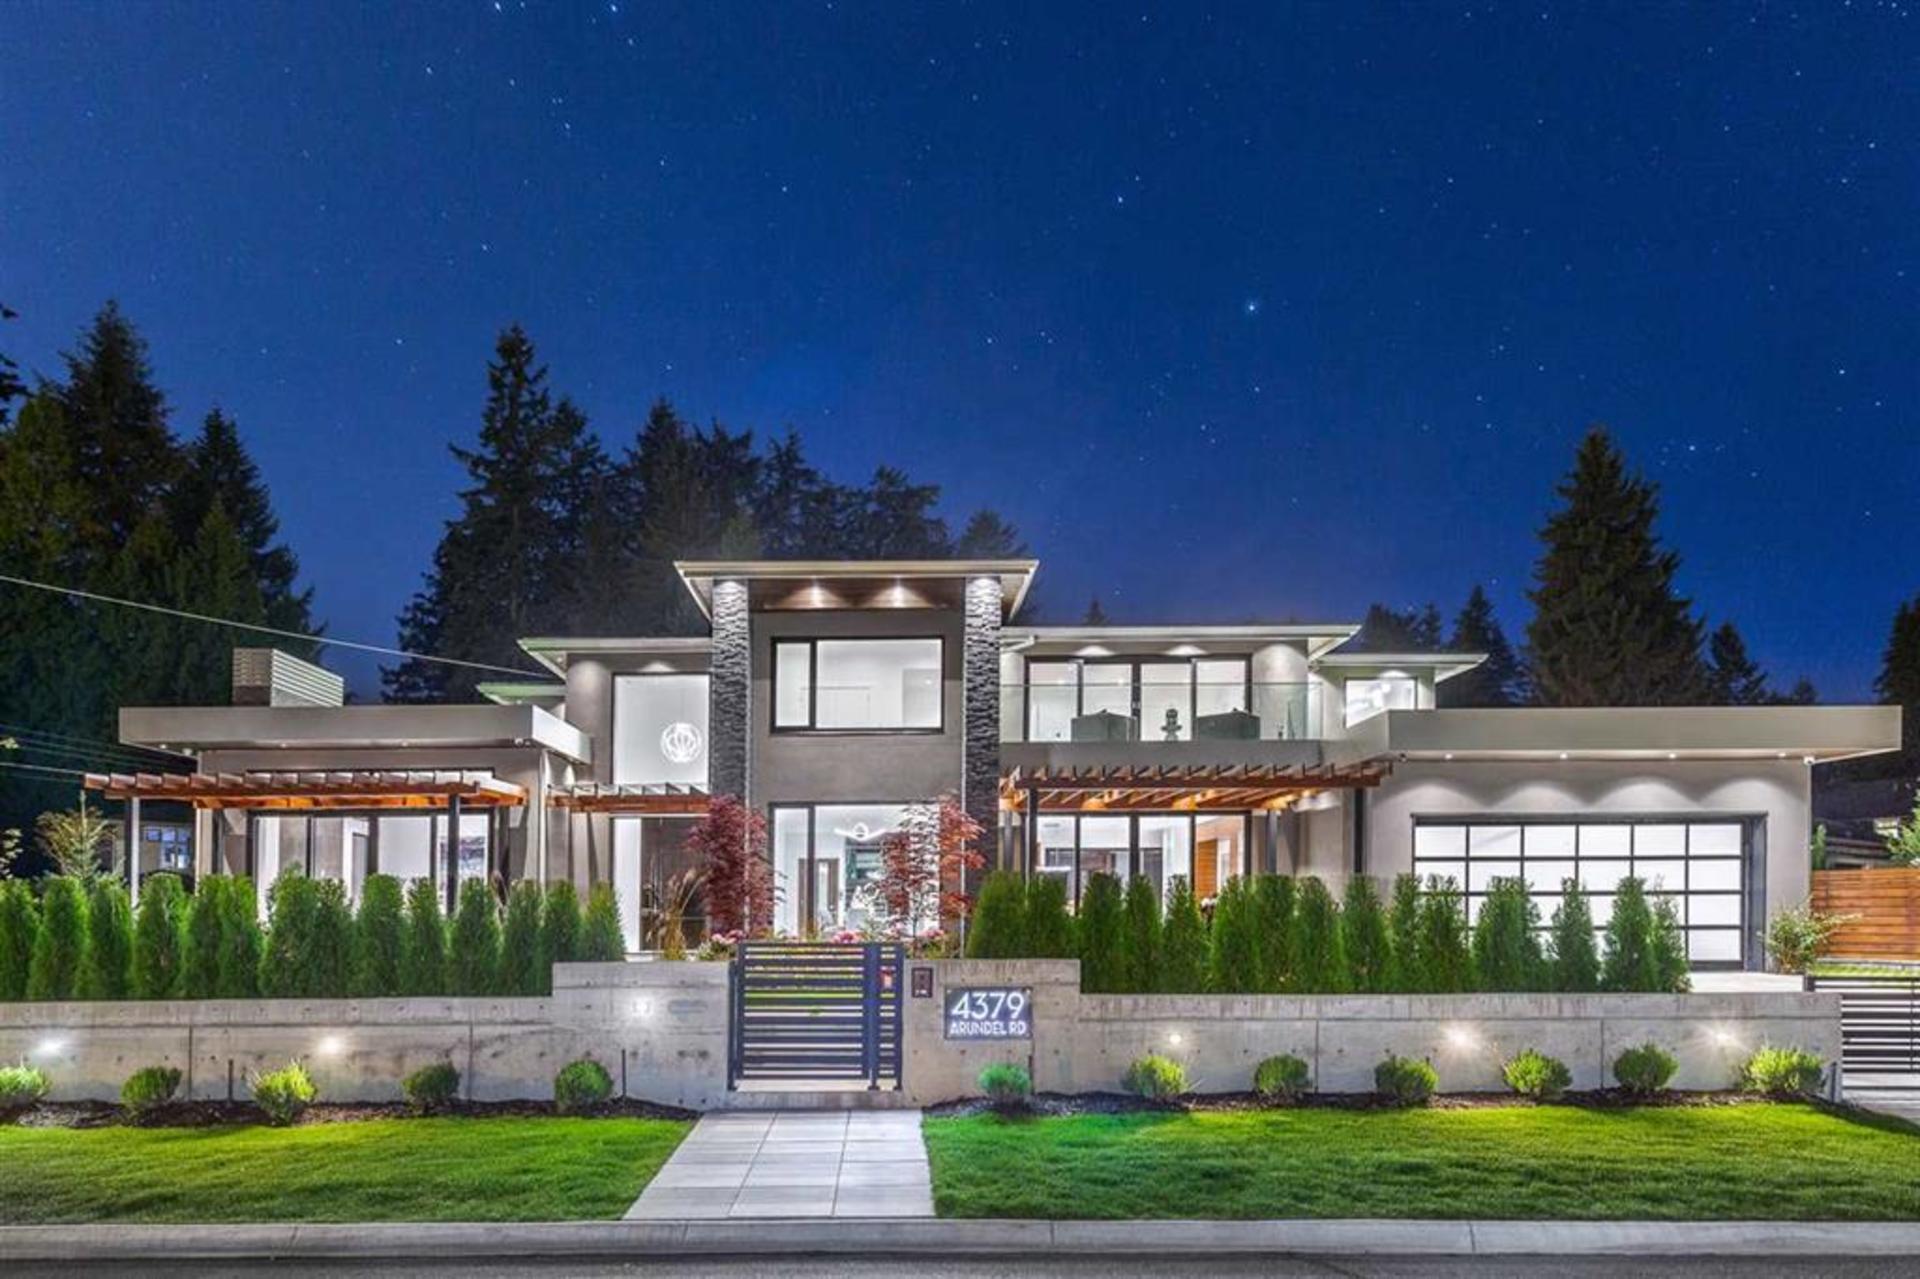 4379 Arundel, Edgemont, North Vancouver